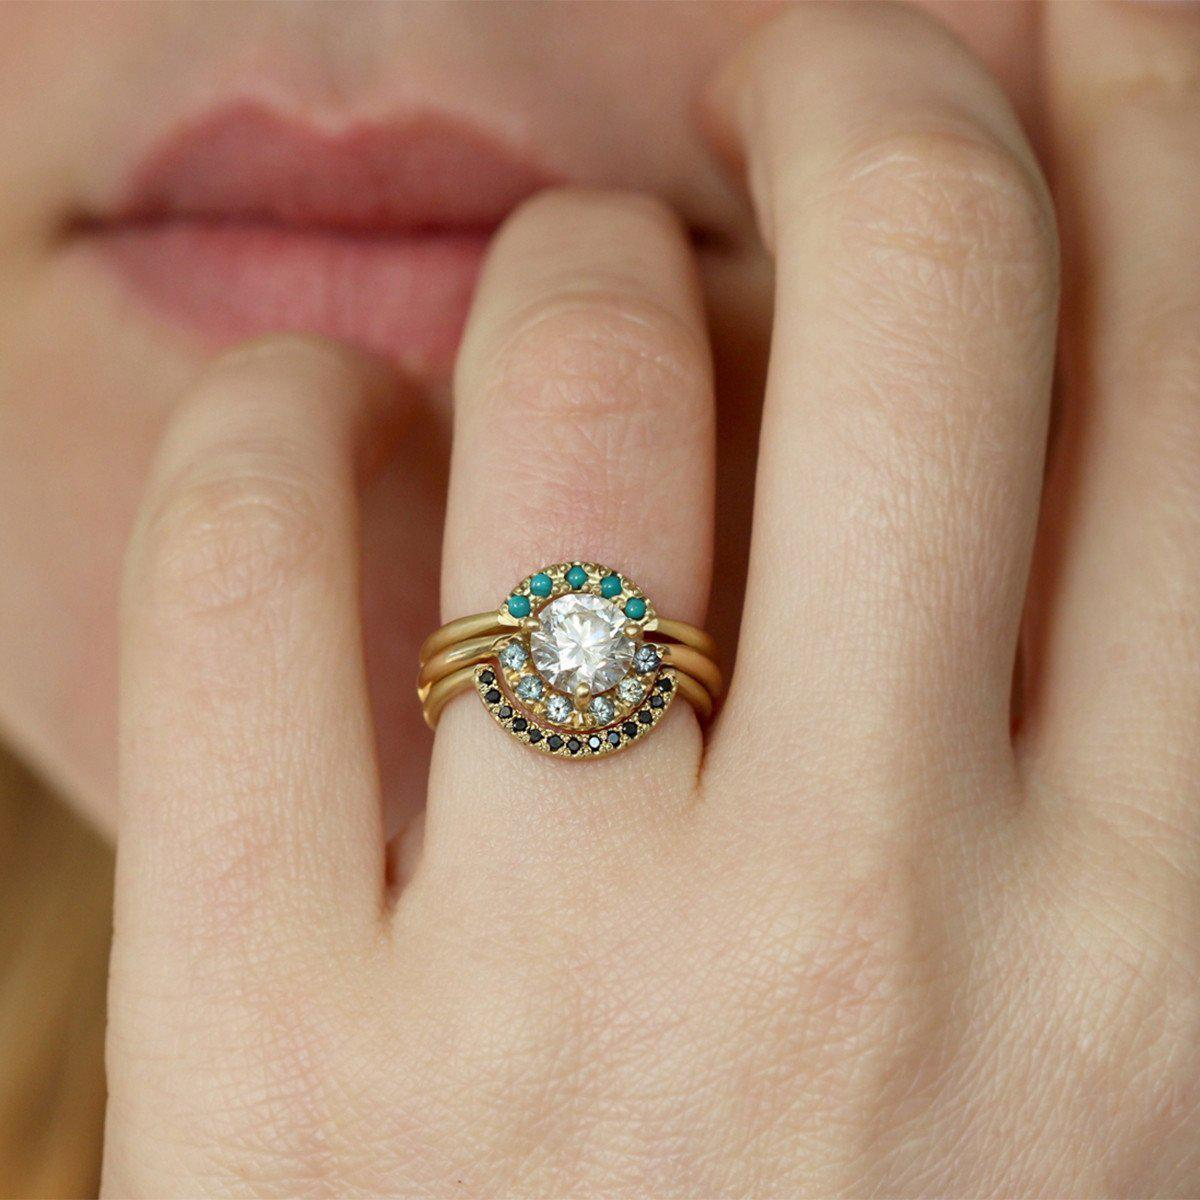 ARTEMER Boho Wedding Ring Set With Diamond Sapphire And Turquoise